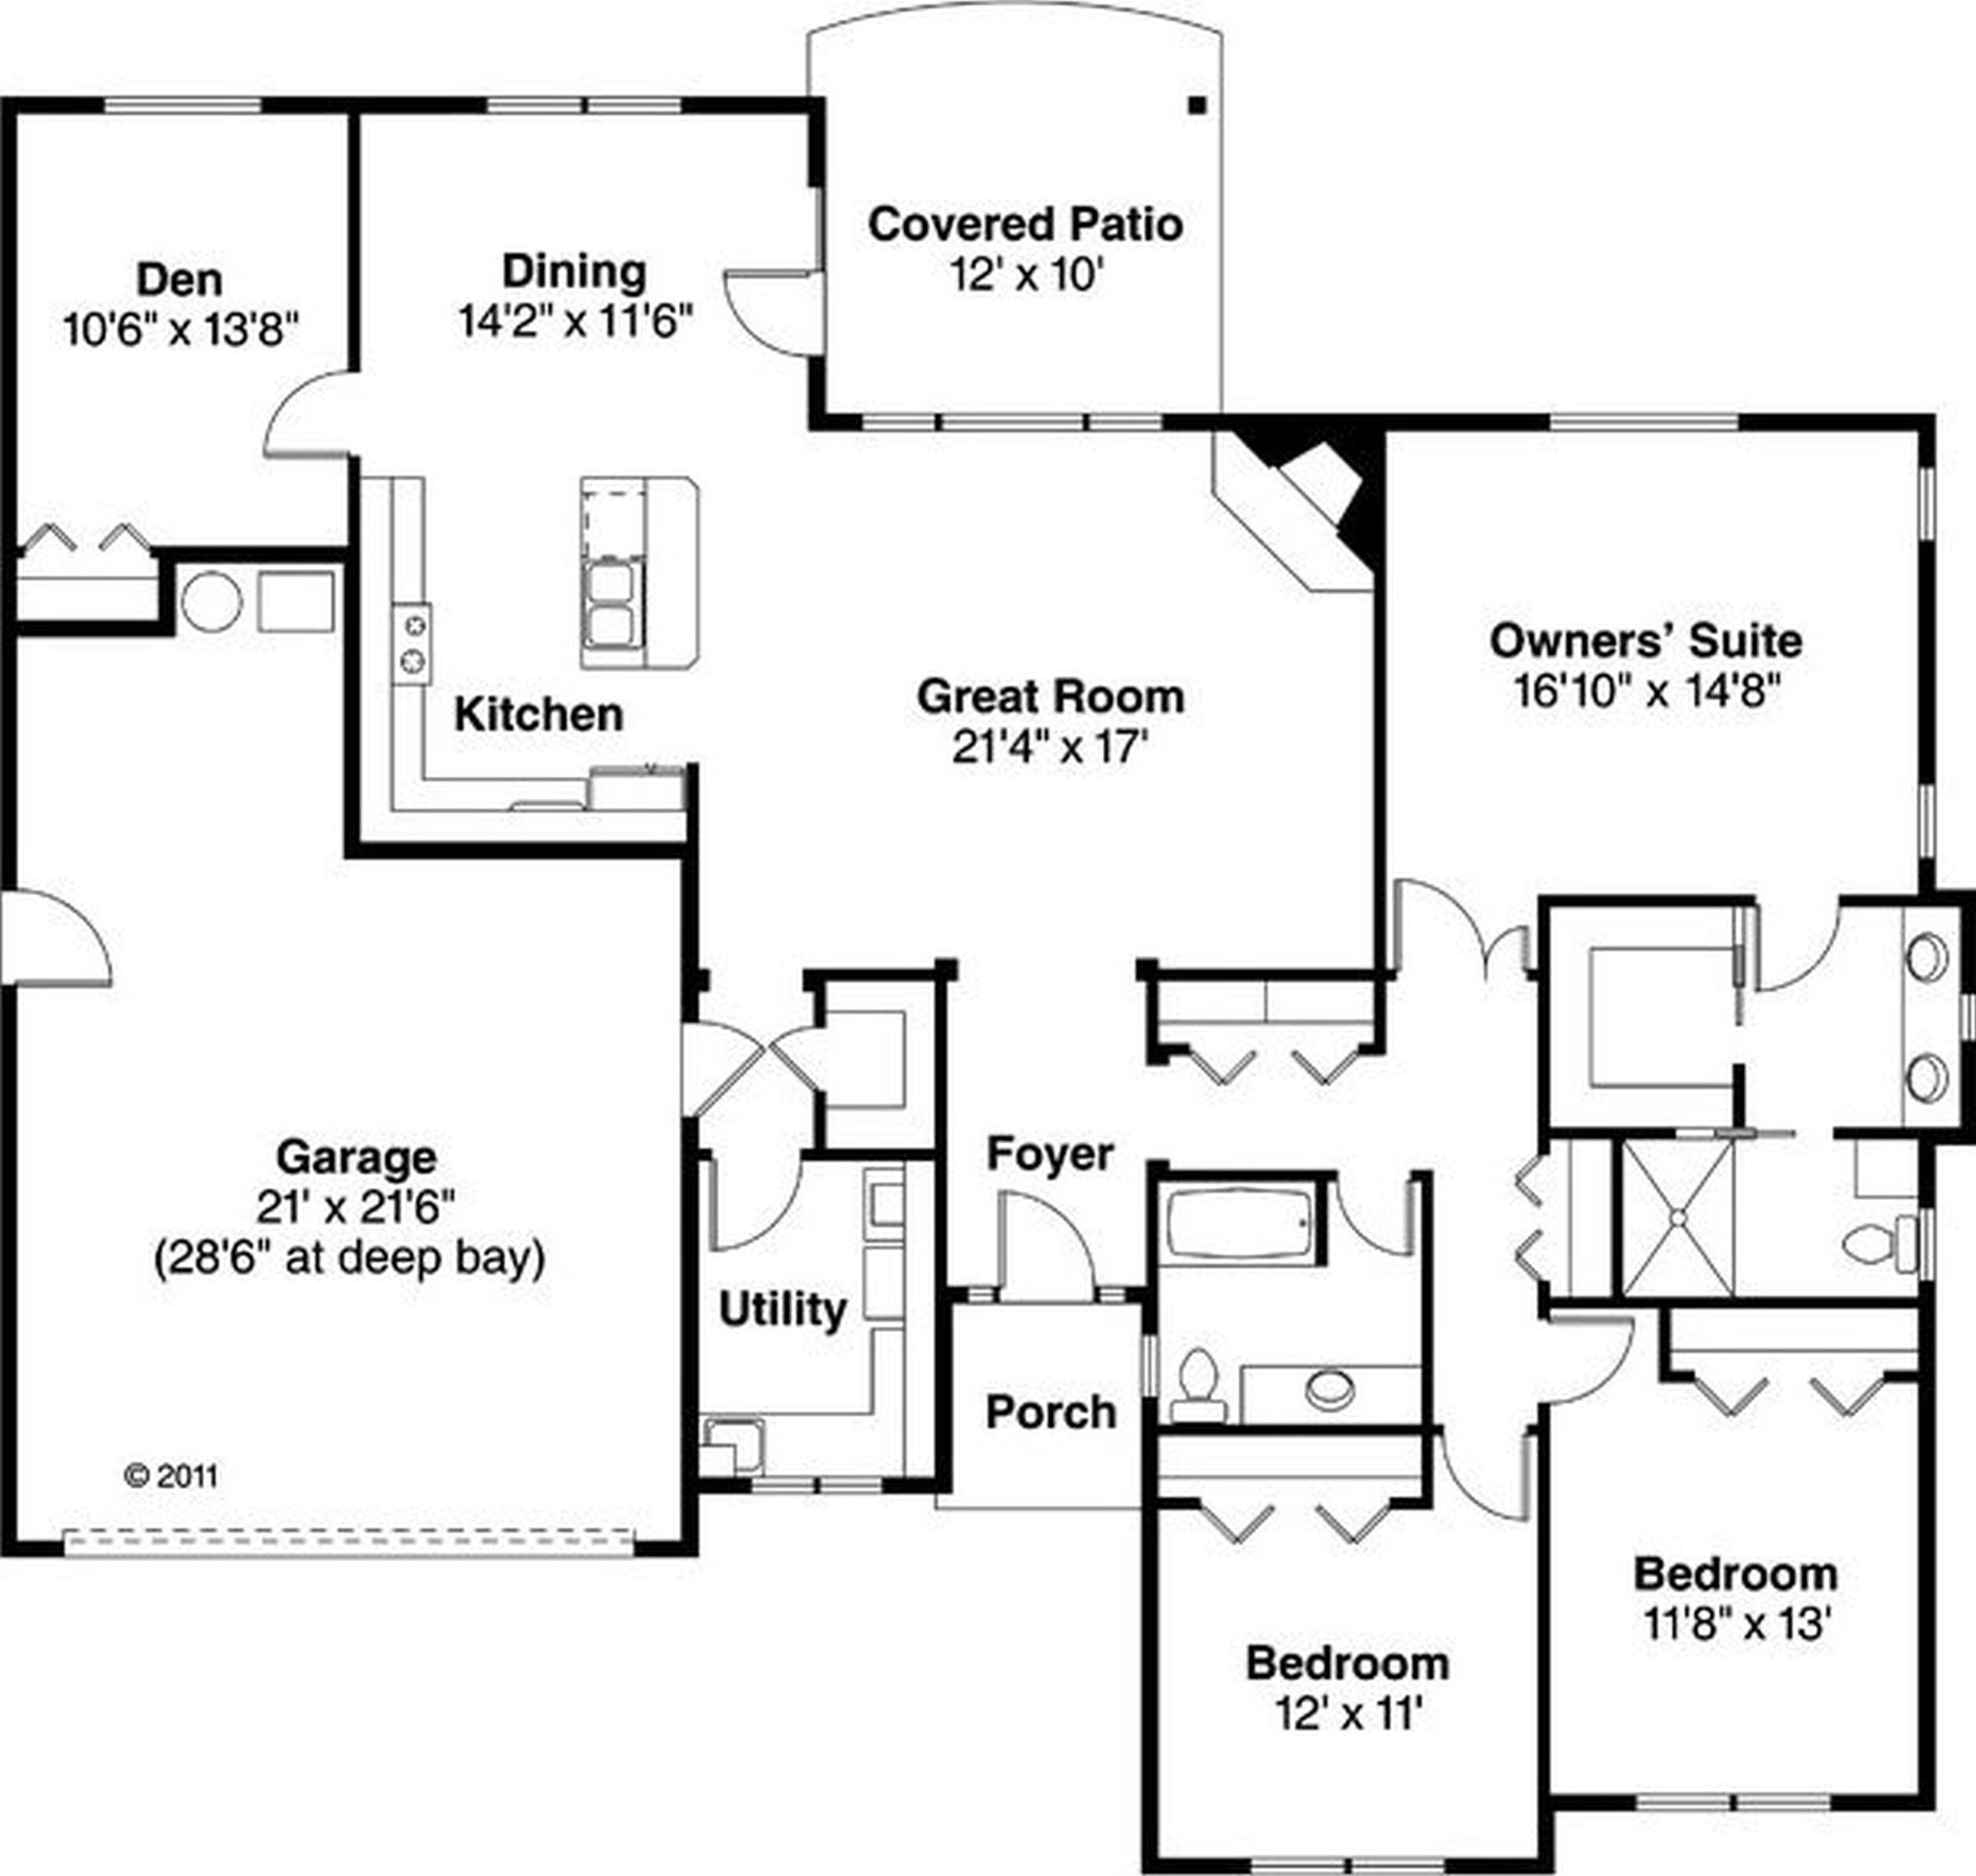 21 New House Floor Plan Creator Image Minecraft Modern House Blueprints Minecraft House Plans Minecraft Houses Blueprints